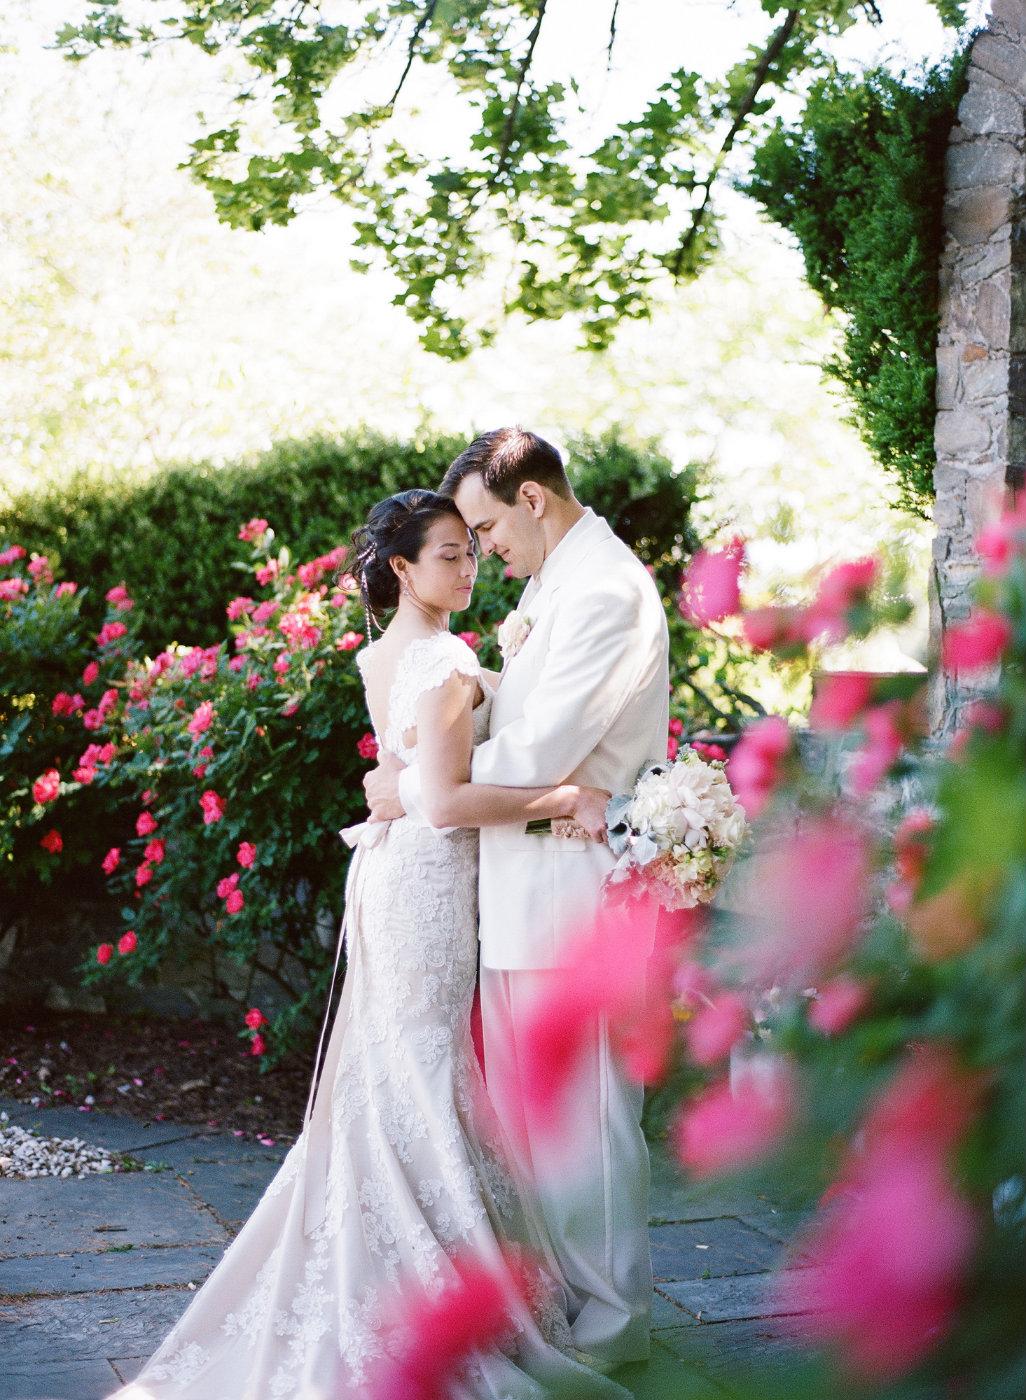 reviews on Audra Wrisley, Northern VA wedding photographer